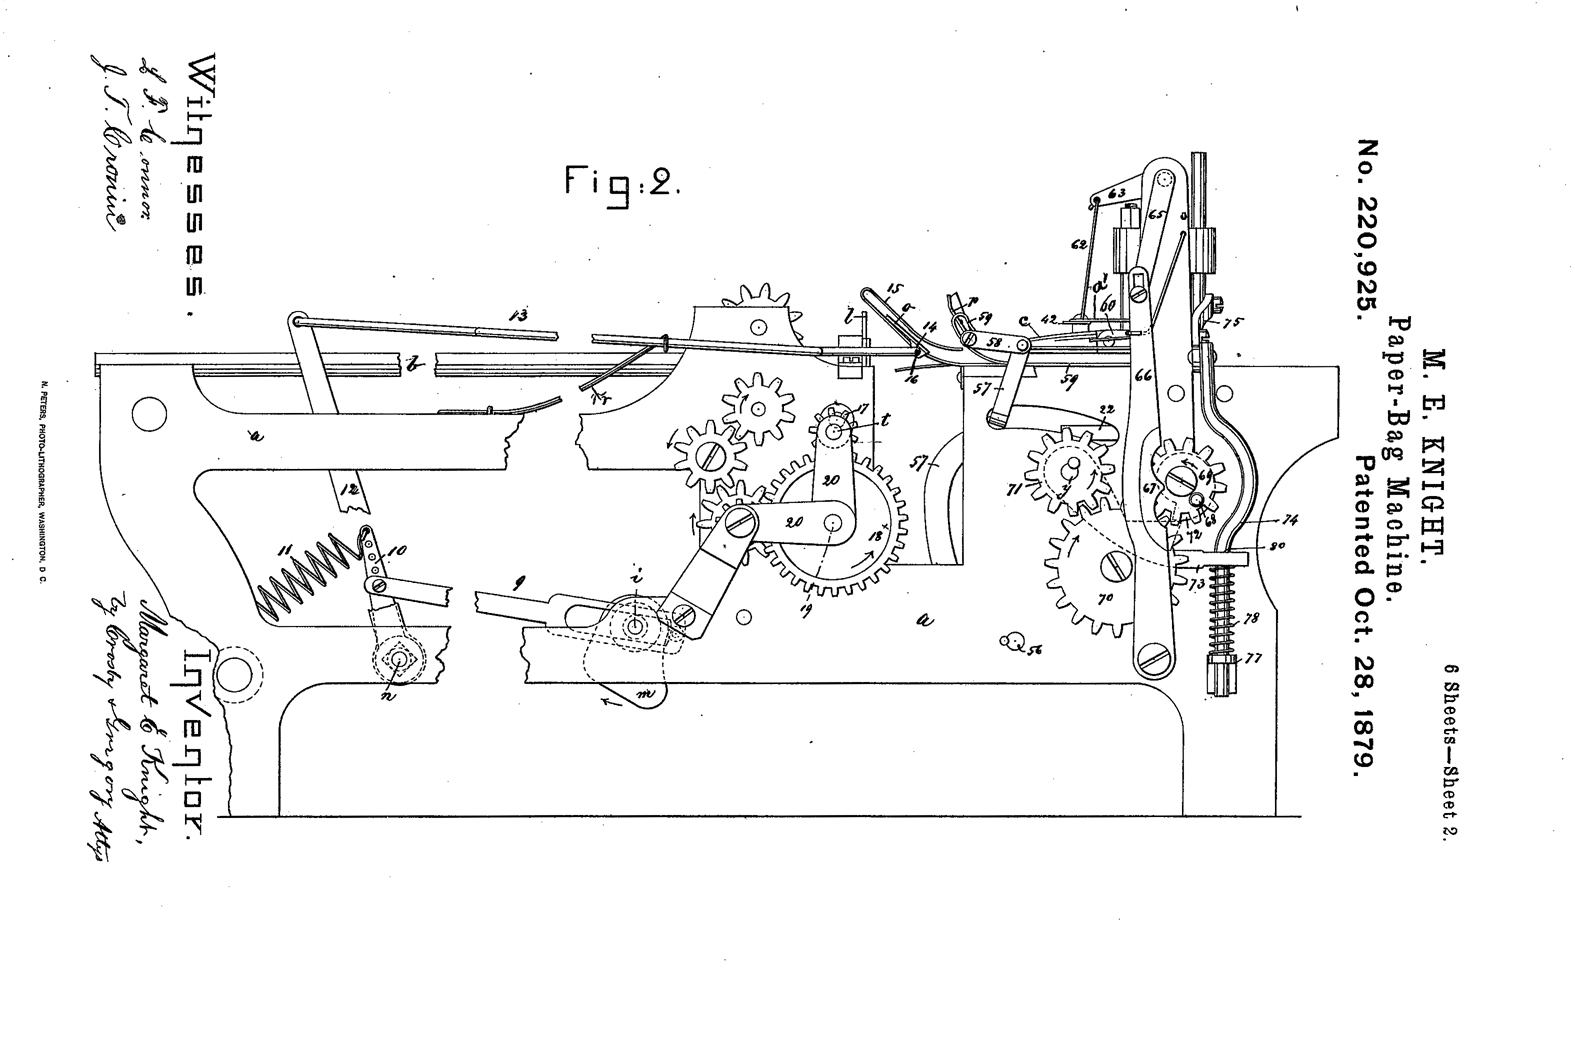 Margaret Knight Invents A Machine To Make Flat Bottom